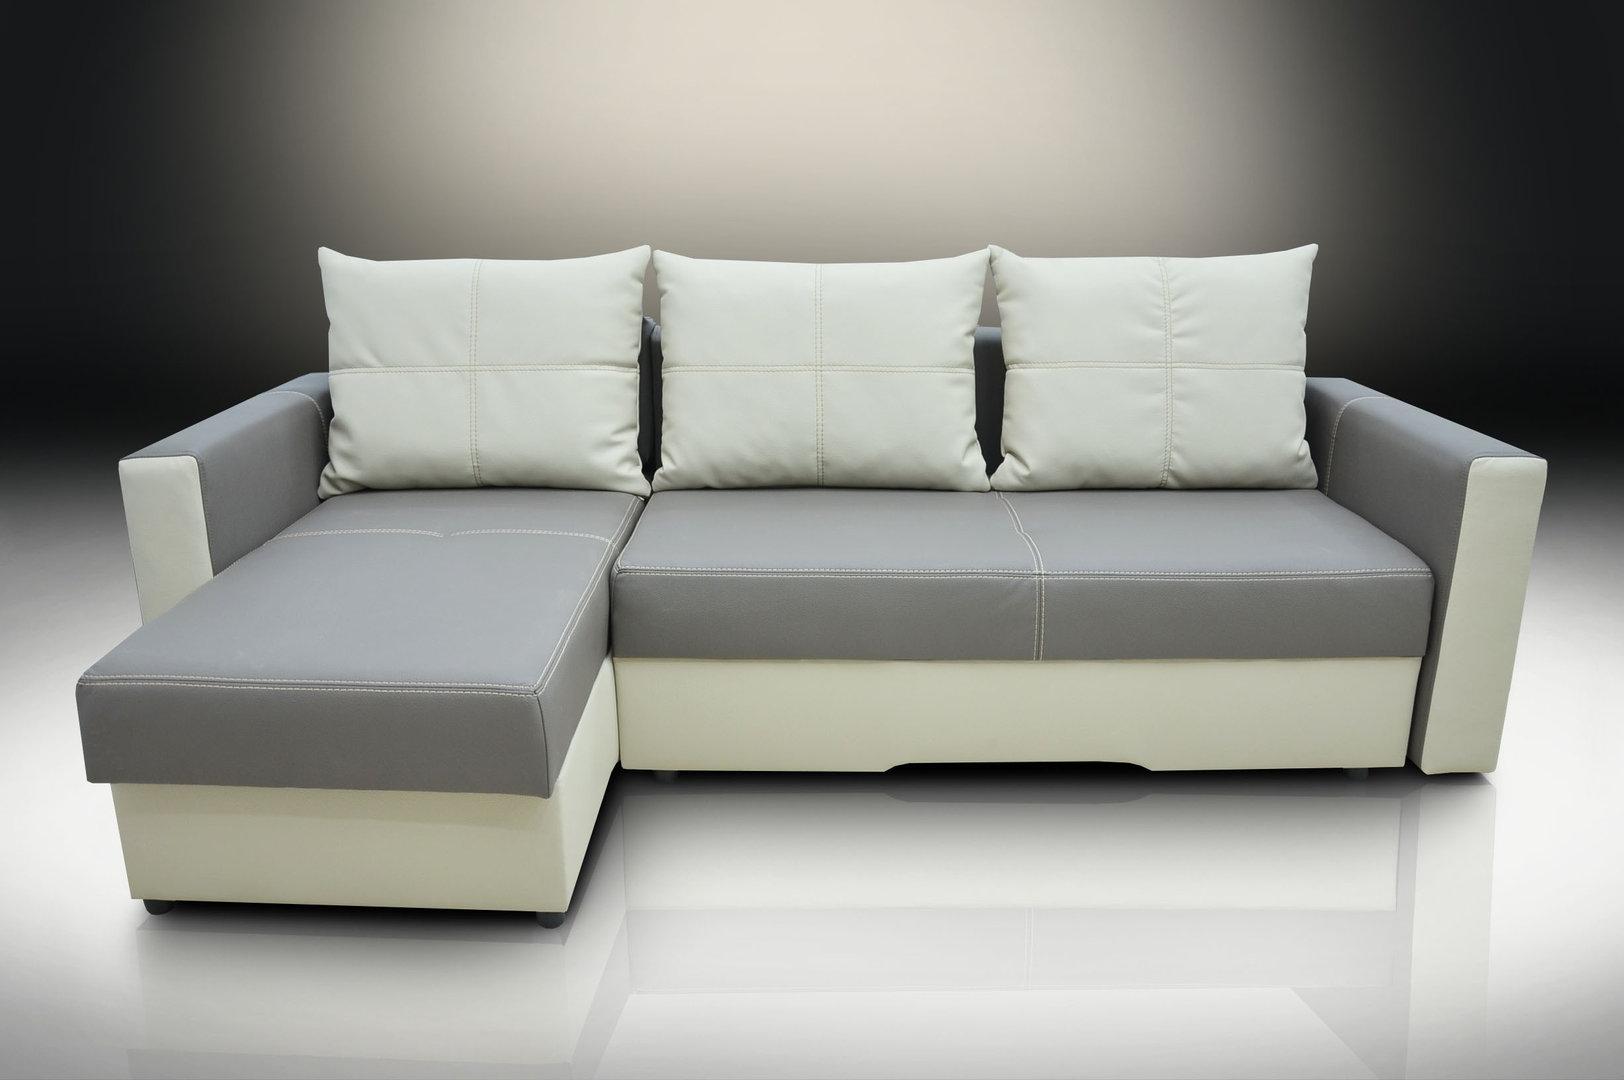 bristol sofa beds wicker cushion 15 inspirations sofas ideas